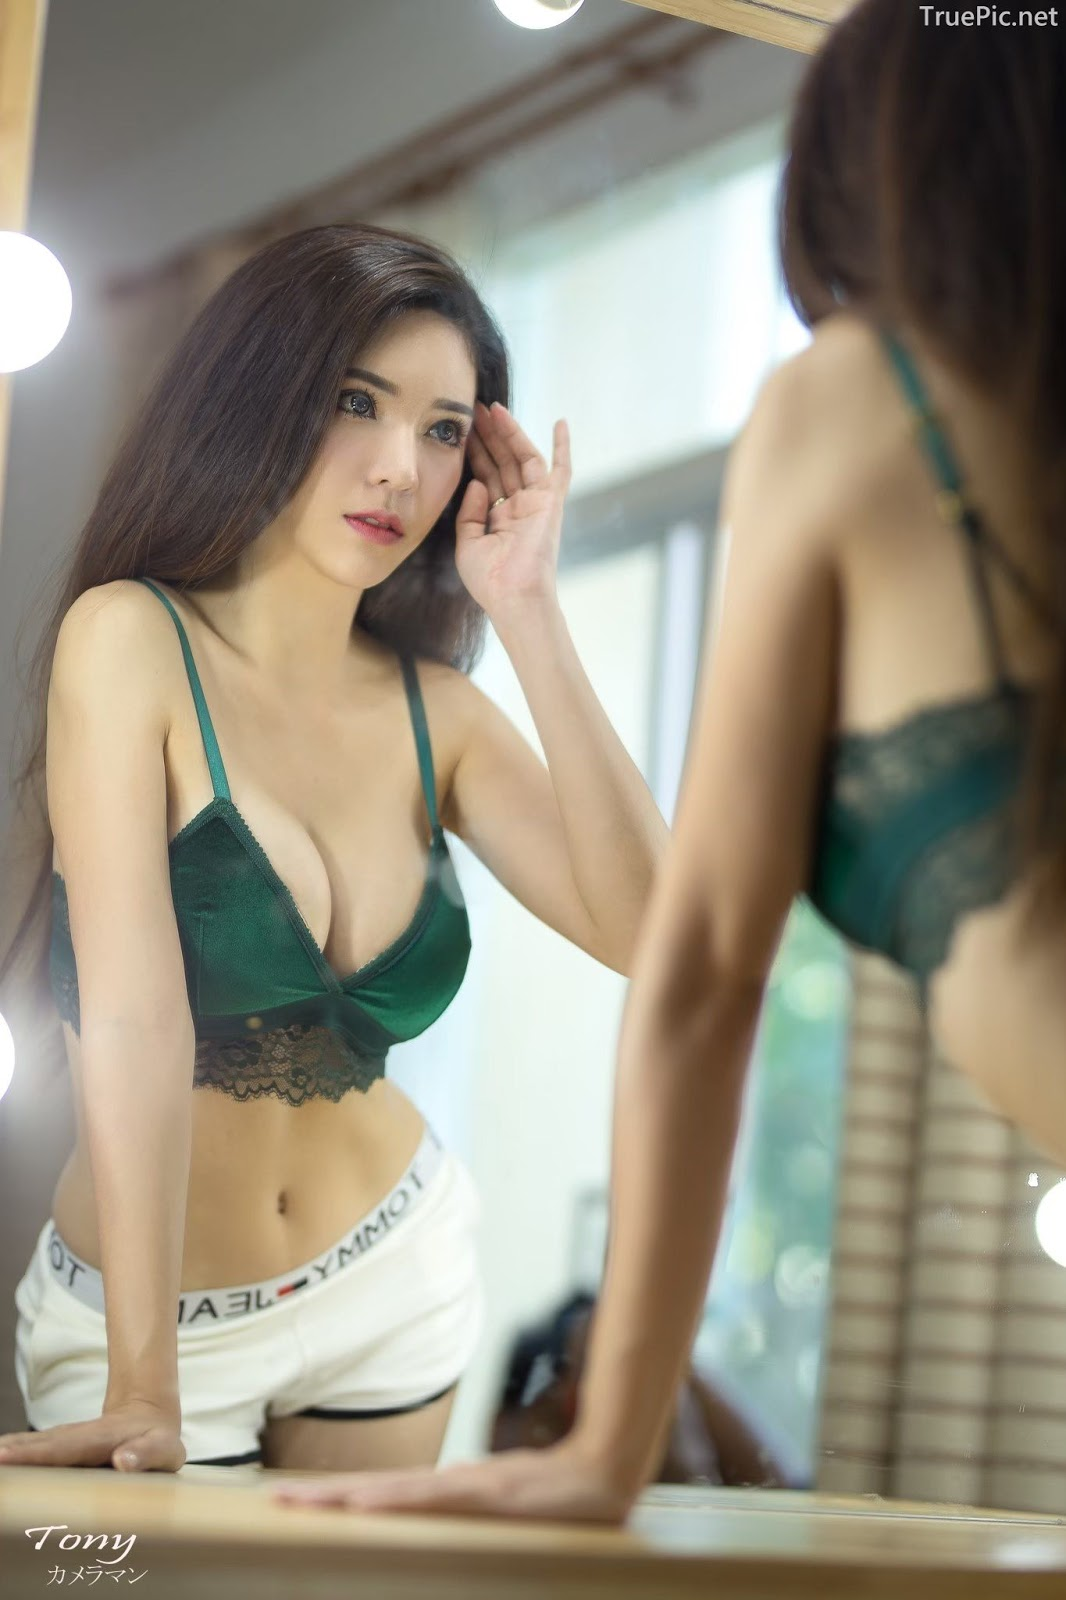 Thailand hot model – Janet Kanokwan Saesim – Sexy vs Cute and Bra vs Long Dress - Picture 10